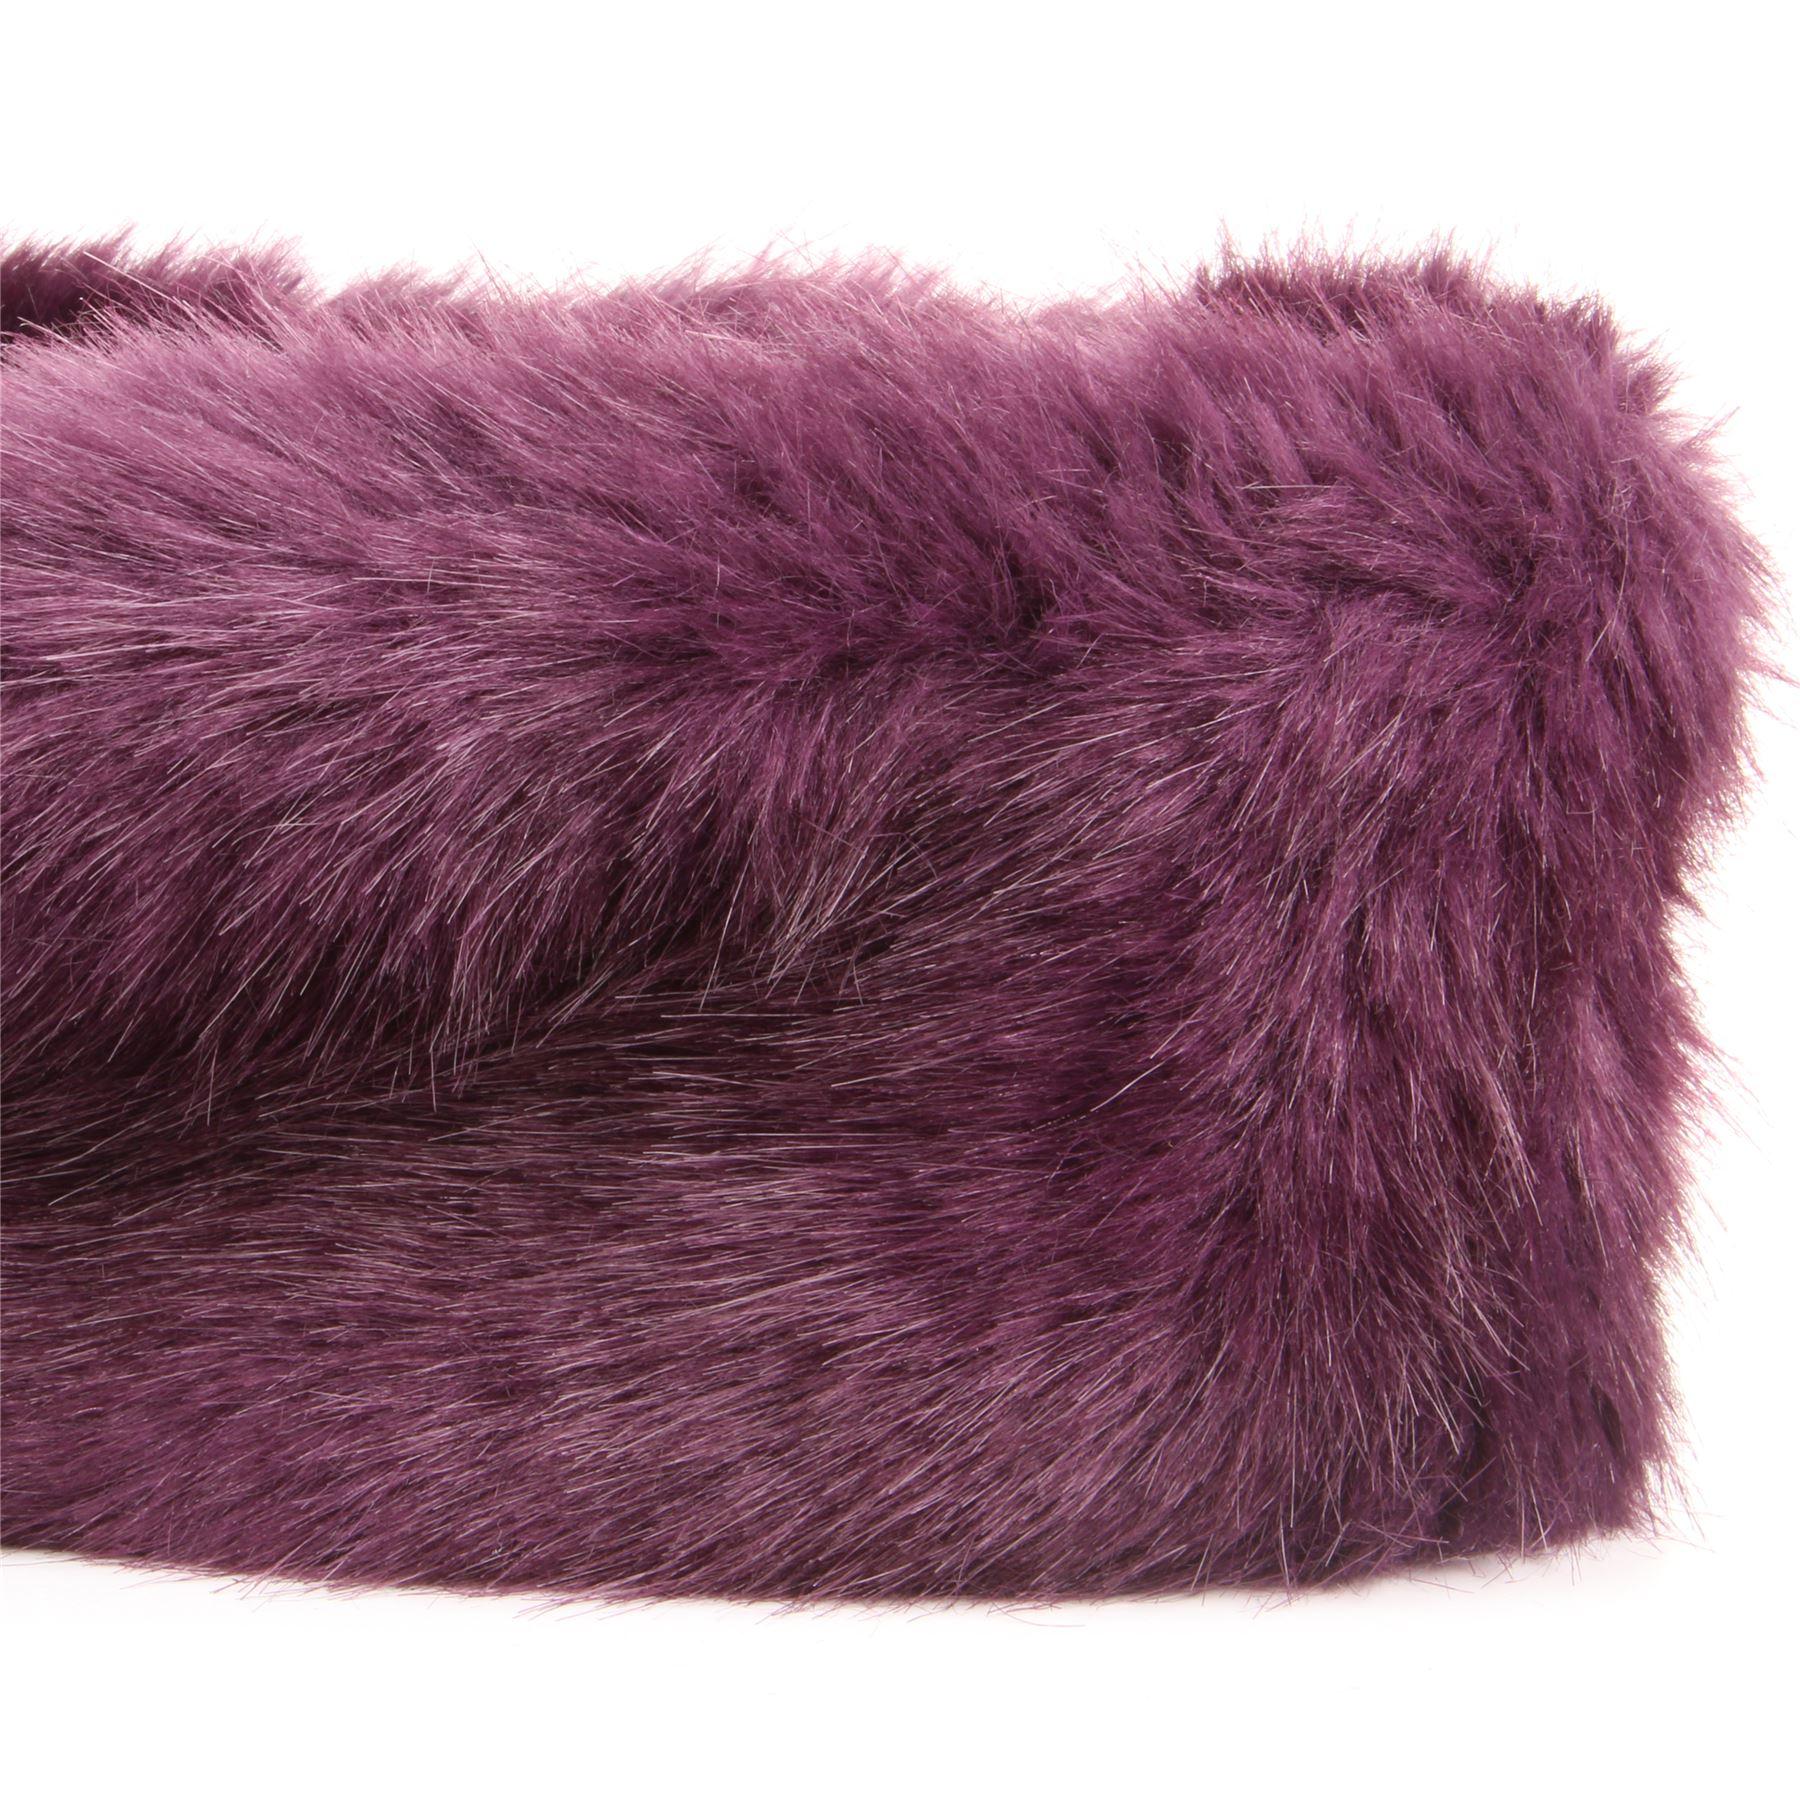 Faux Furry Headband Hawkins Ladies Winter Ski Ear Fleece Lining Head ... d0ea1a7a644